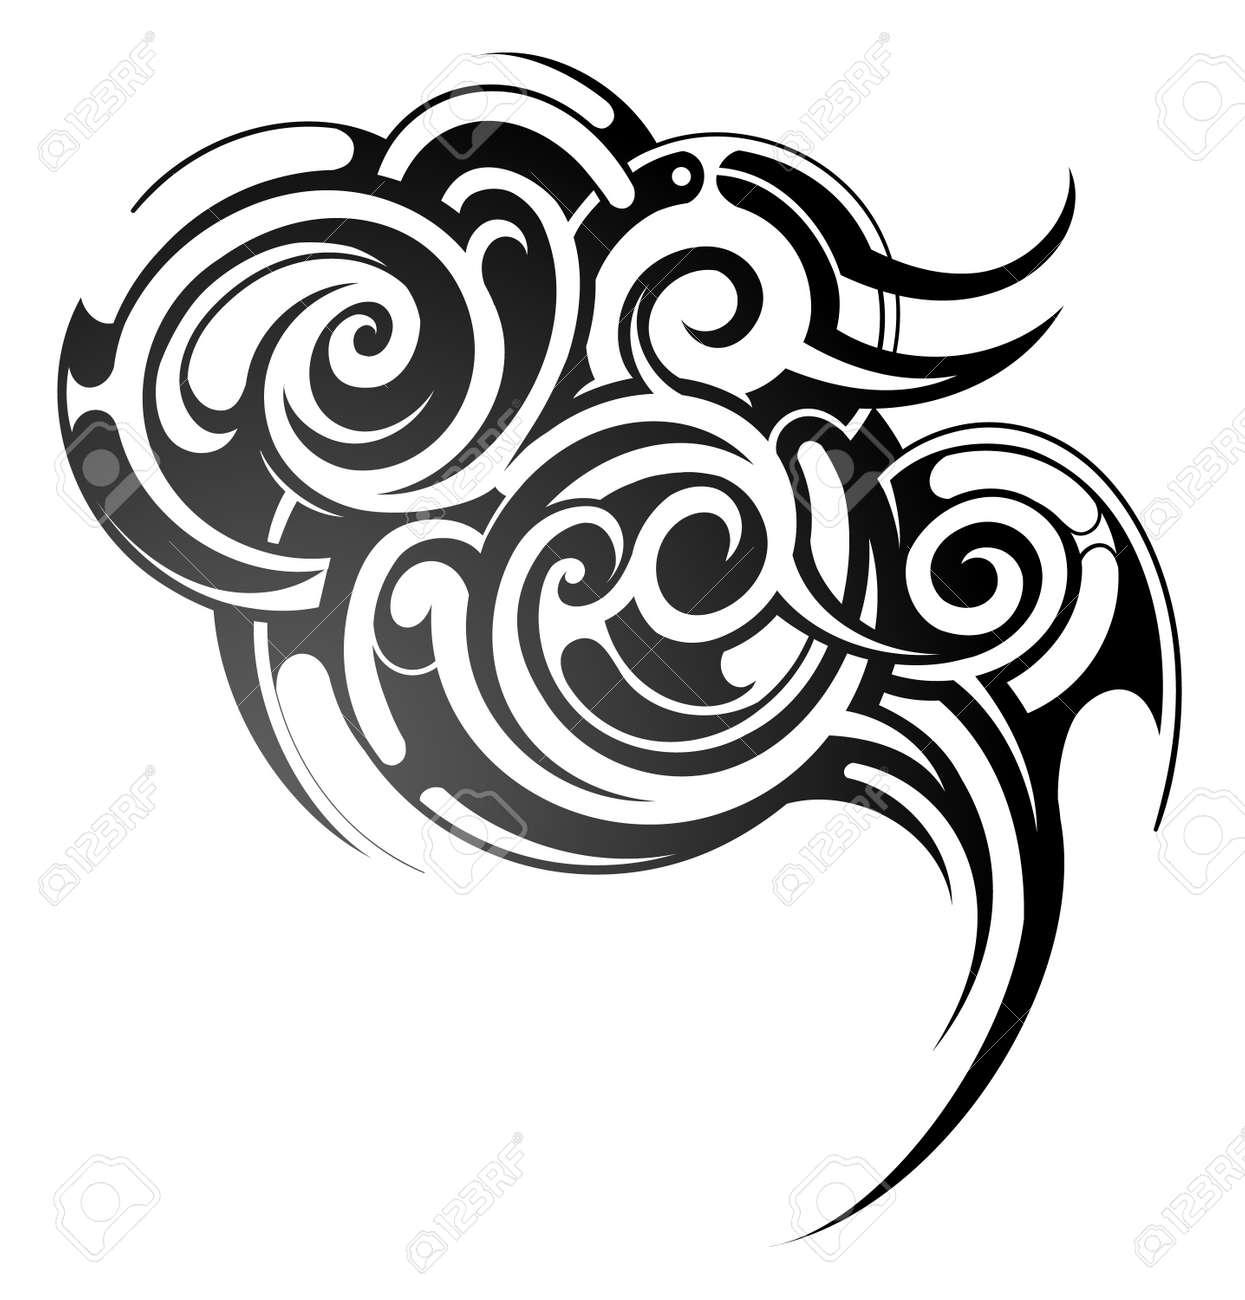 Decorative tribal art tattoo isolated on white - 18561131